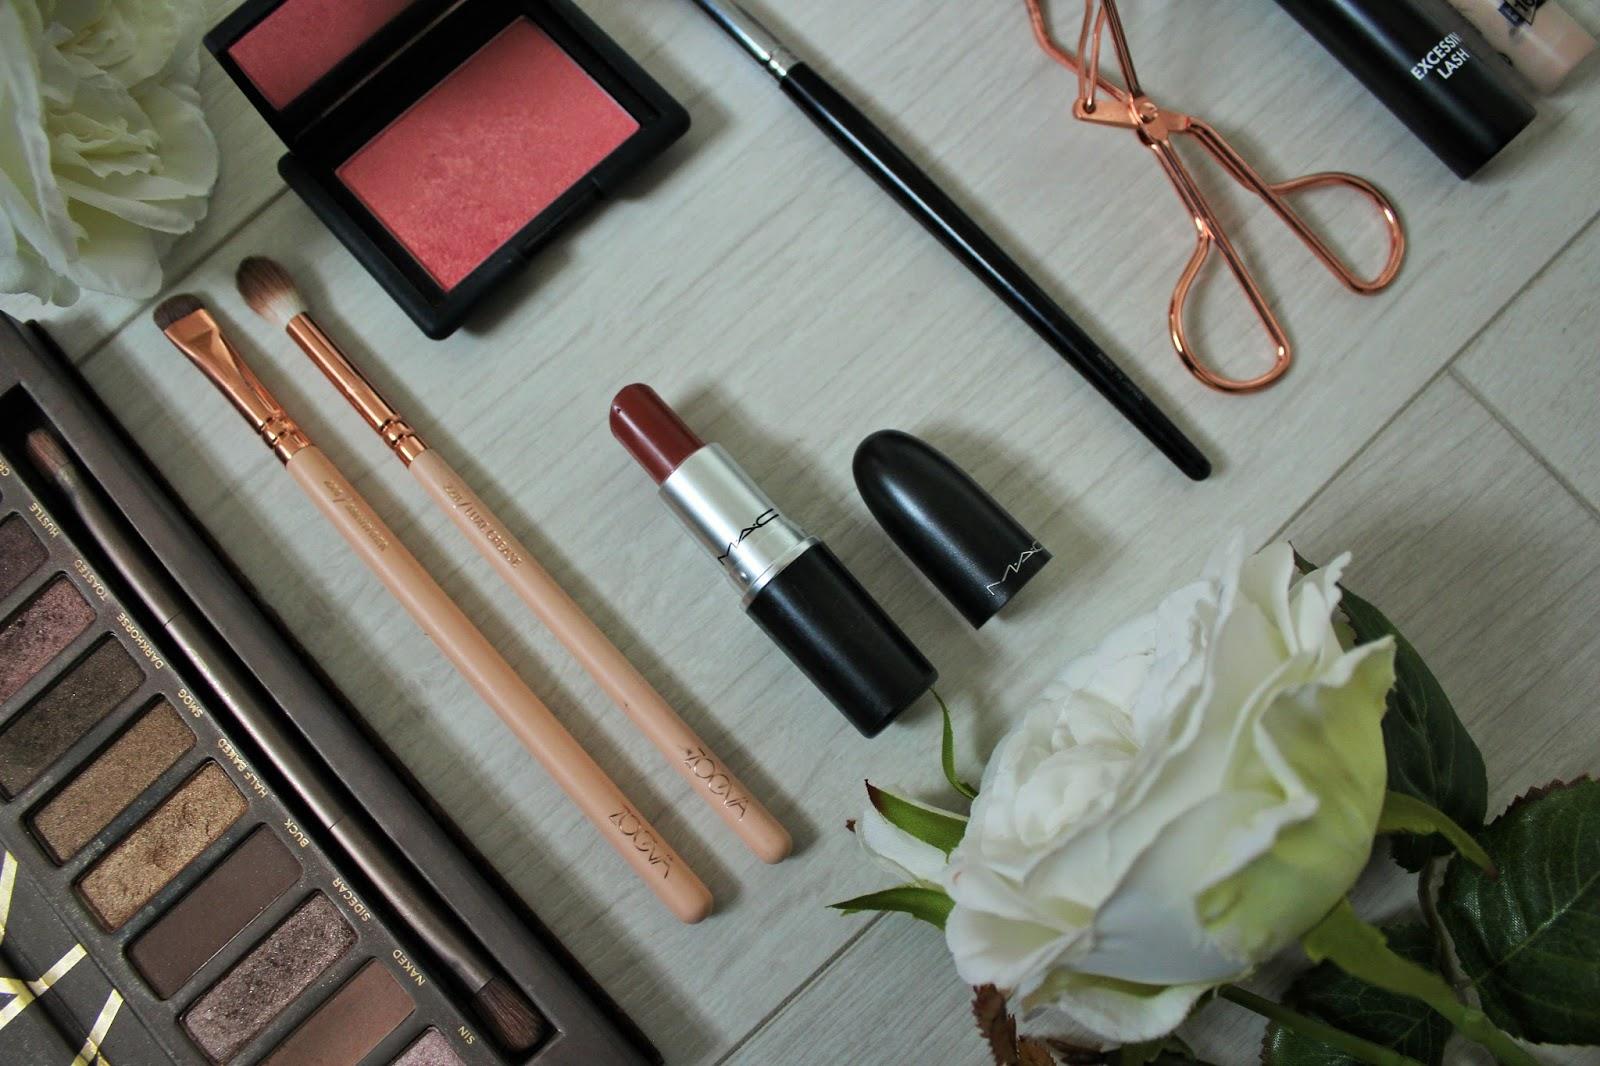 Emma Stone Oscars Inspired Makeup Look - 8